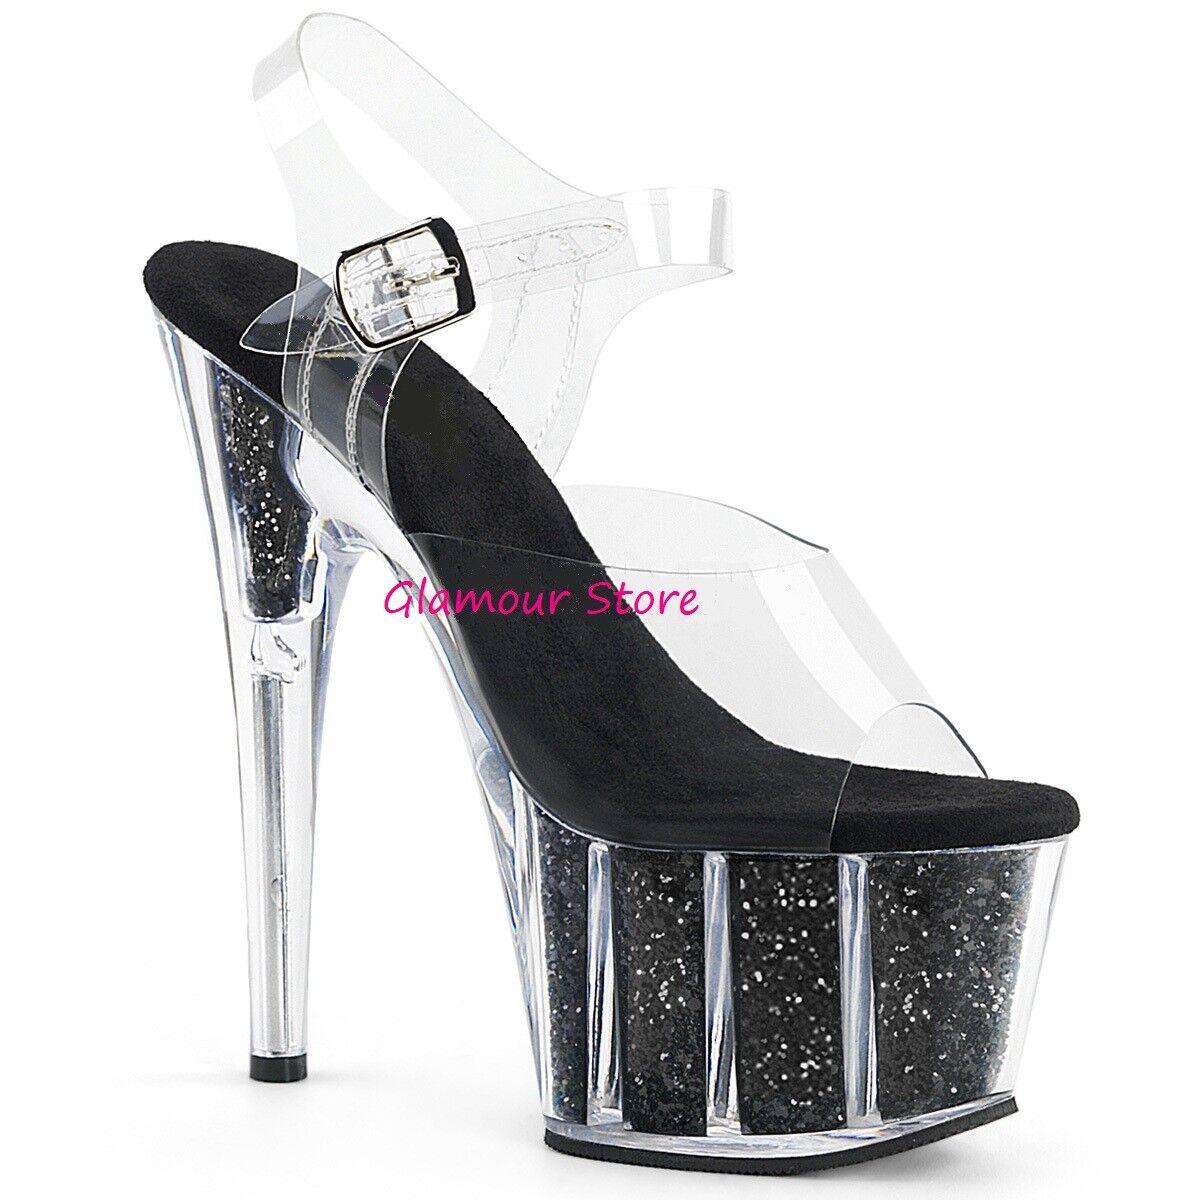 Sexy SANDALI SANDALI SANDALI GLITTER tacco 18 noir TRASPARENTE plateau dal 35 a 42 chaussures U.S.A. 9ab7bf